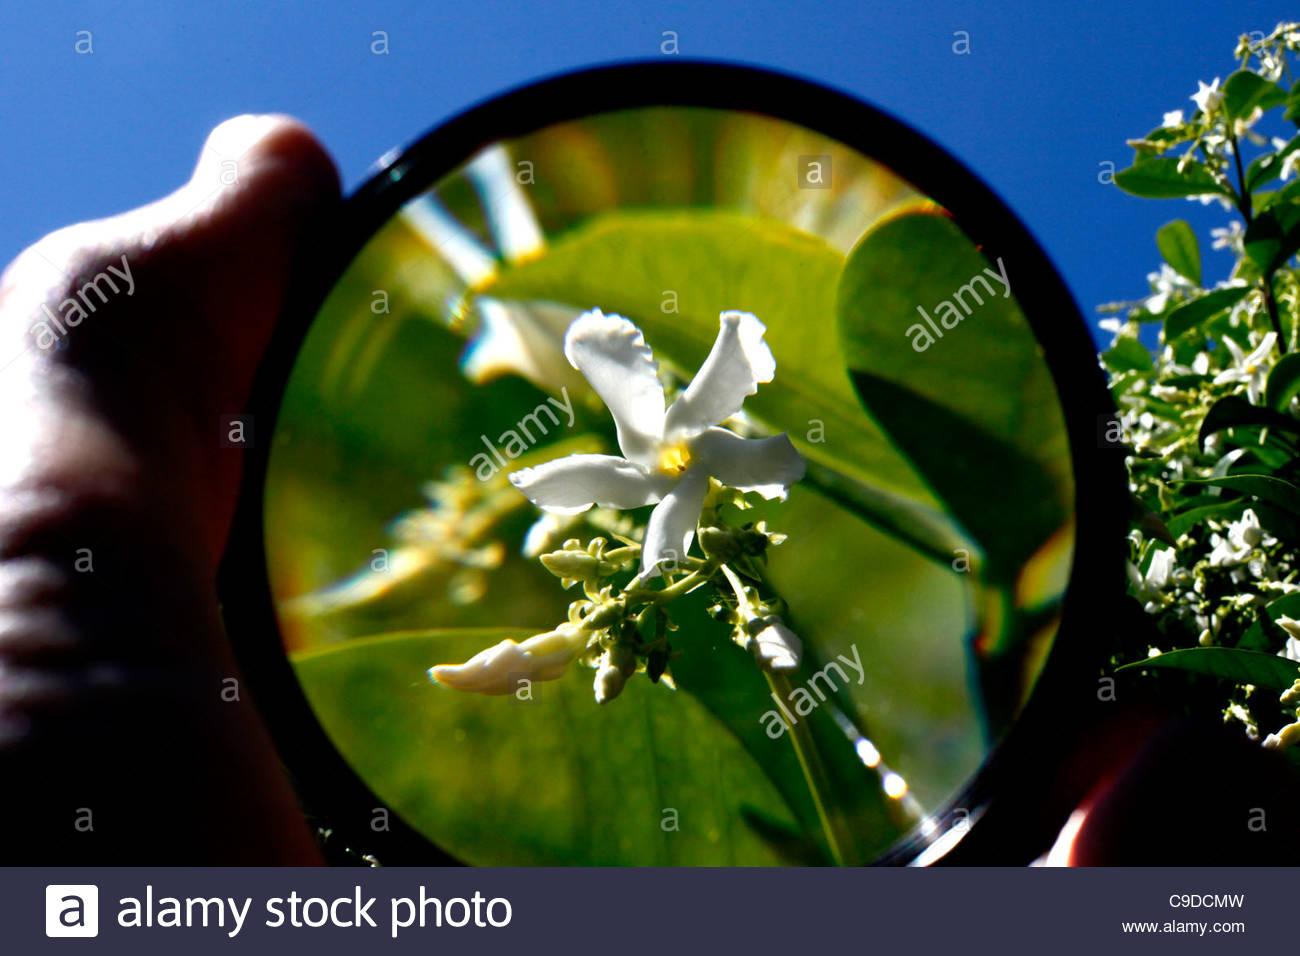 magnifying glass, jasmine - Stock Image